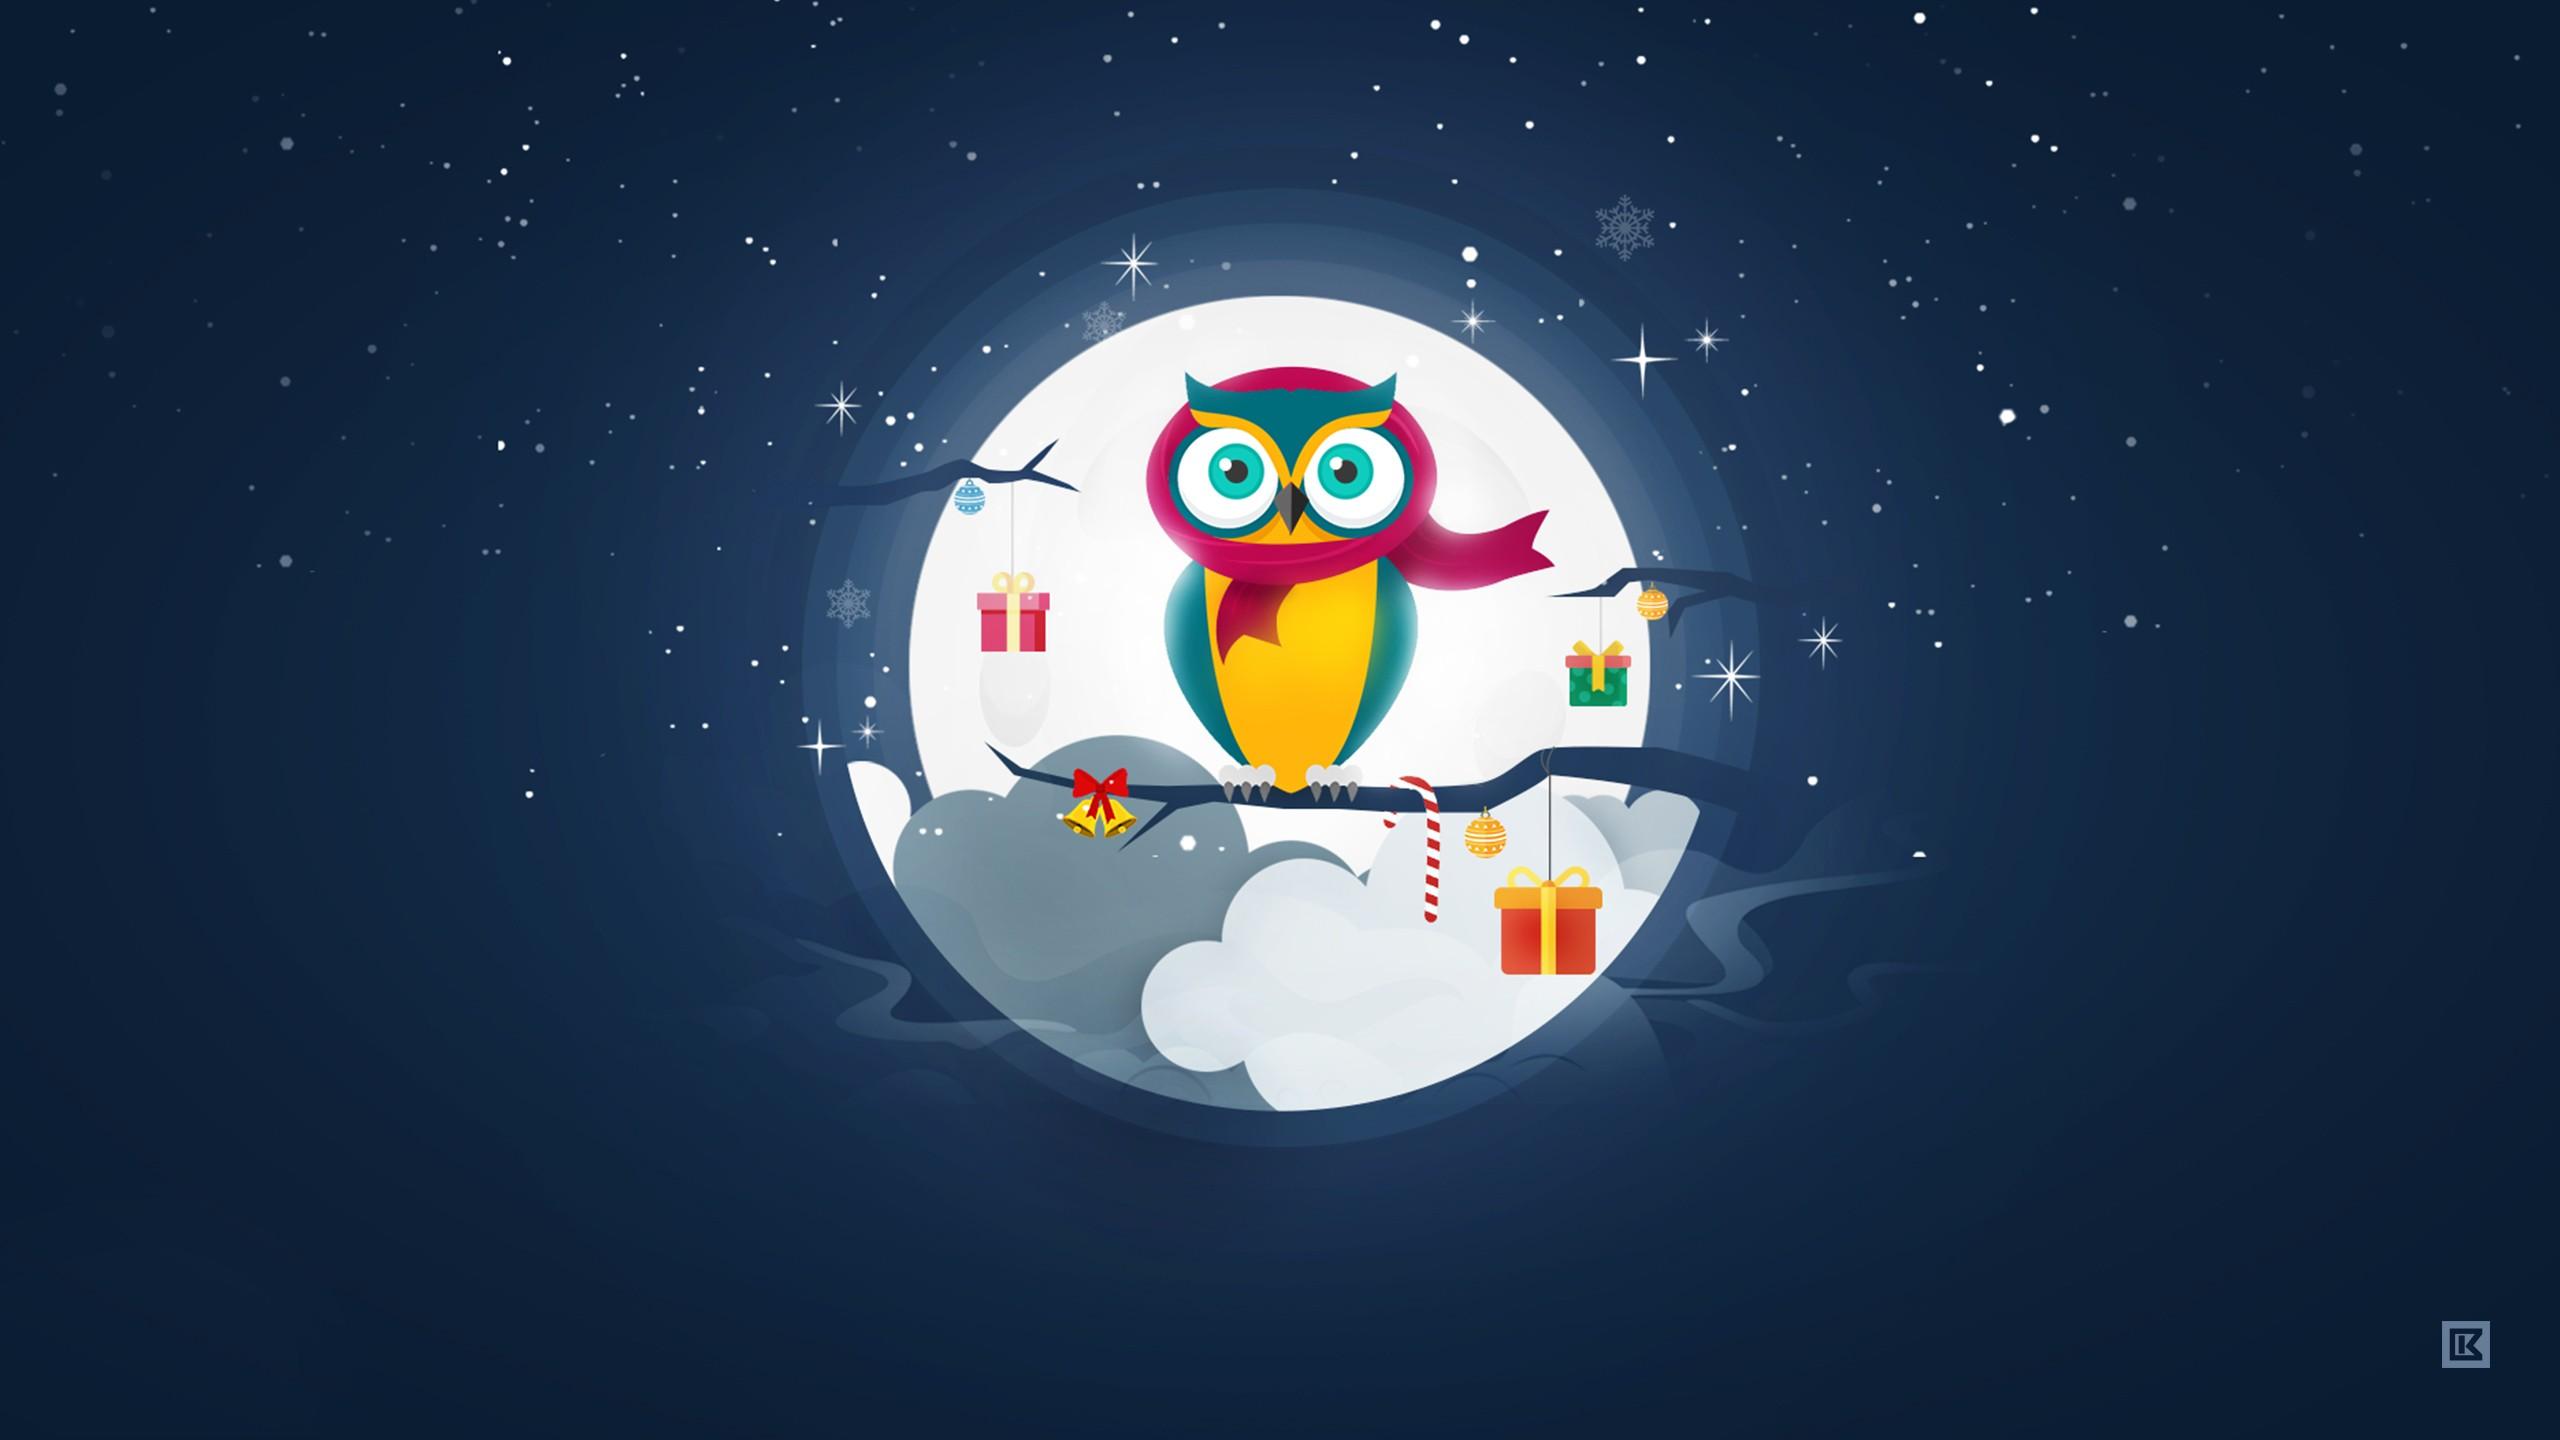 Cute Penguin Wallpaper Desktop Owl Christmas Winter Season Wallpapers Hd Wallpapers